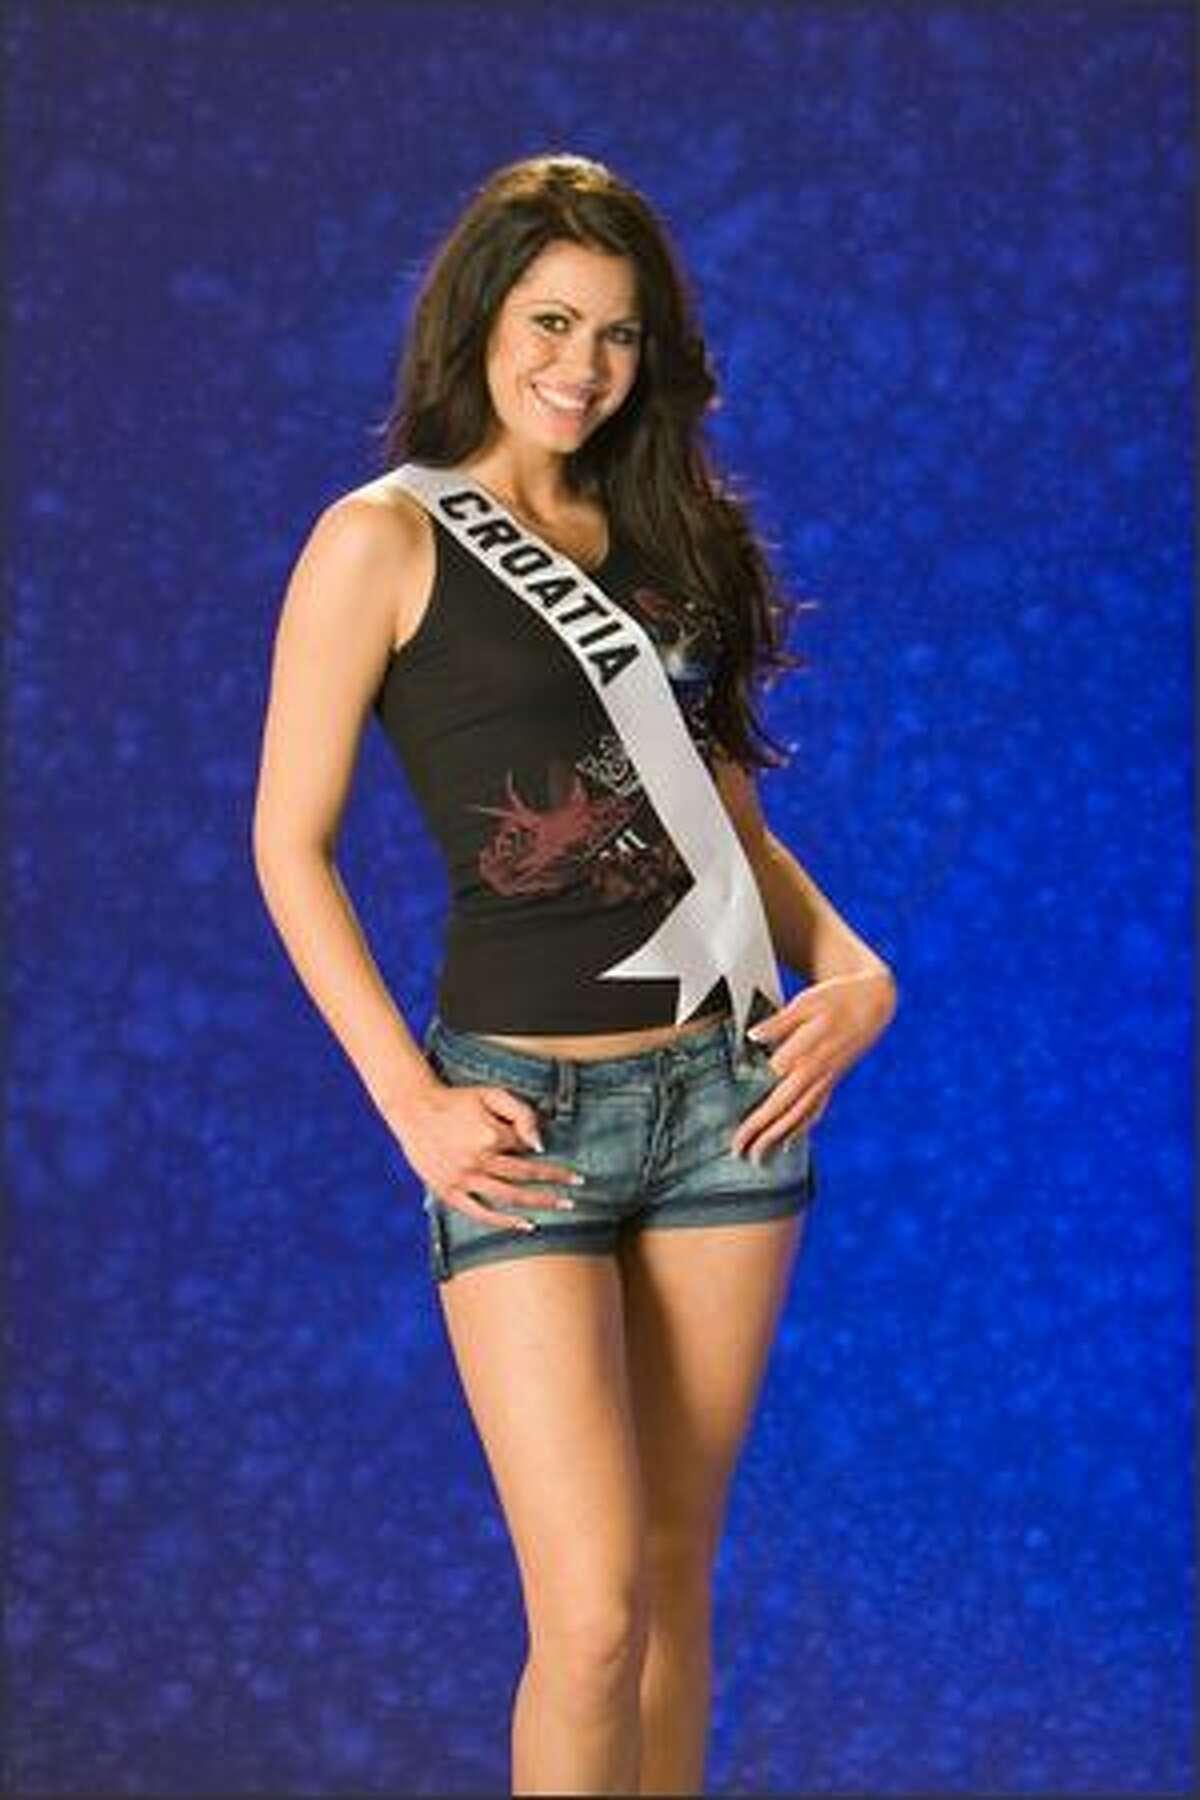 Jelena Maros, Miss Croatia 2007.